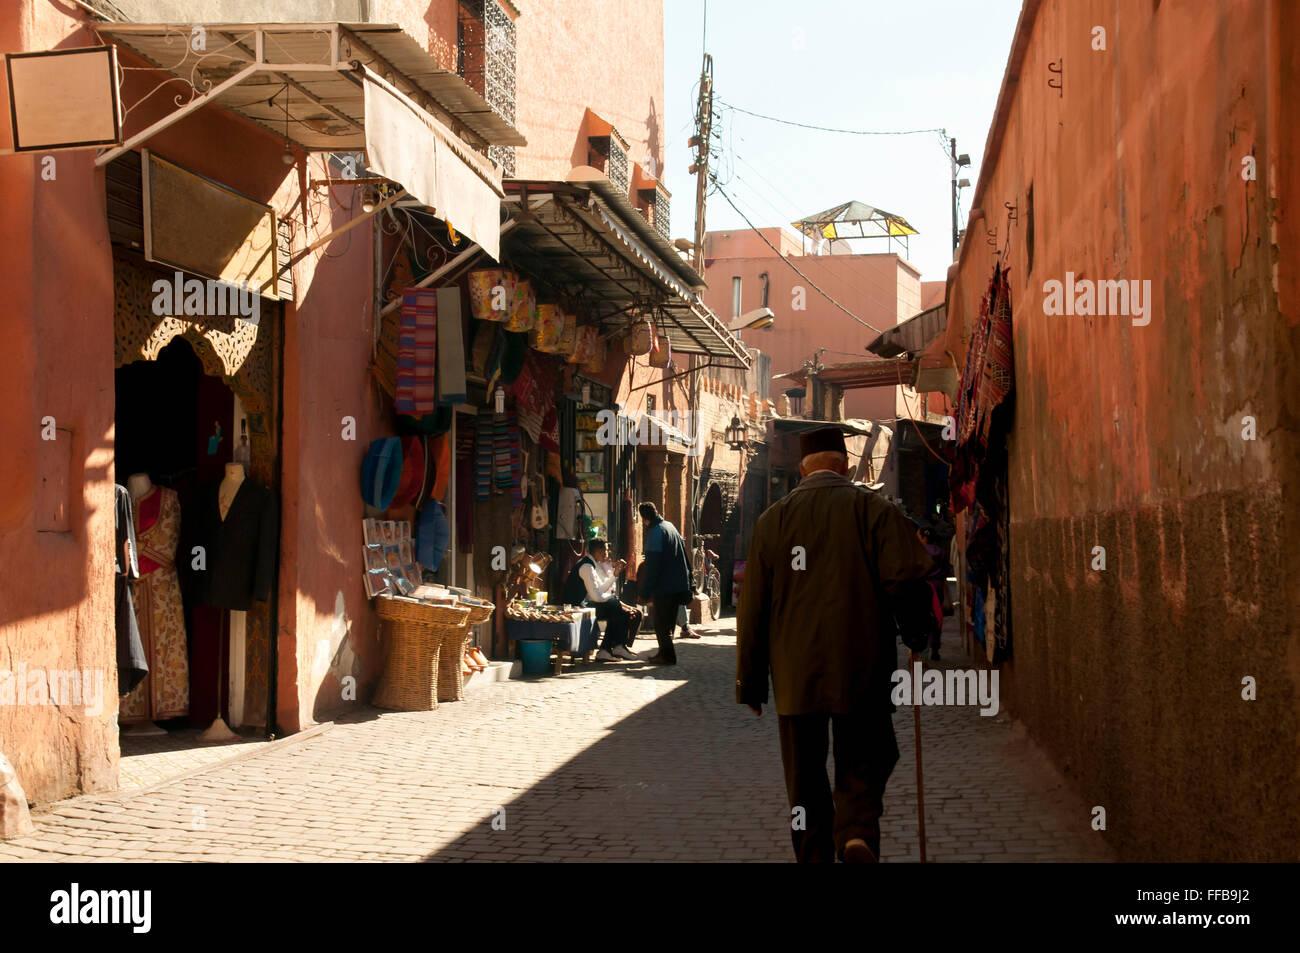 Marrakesh Medina - Morocco Stock Photo